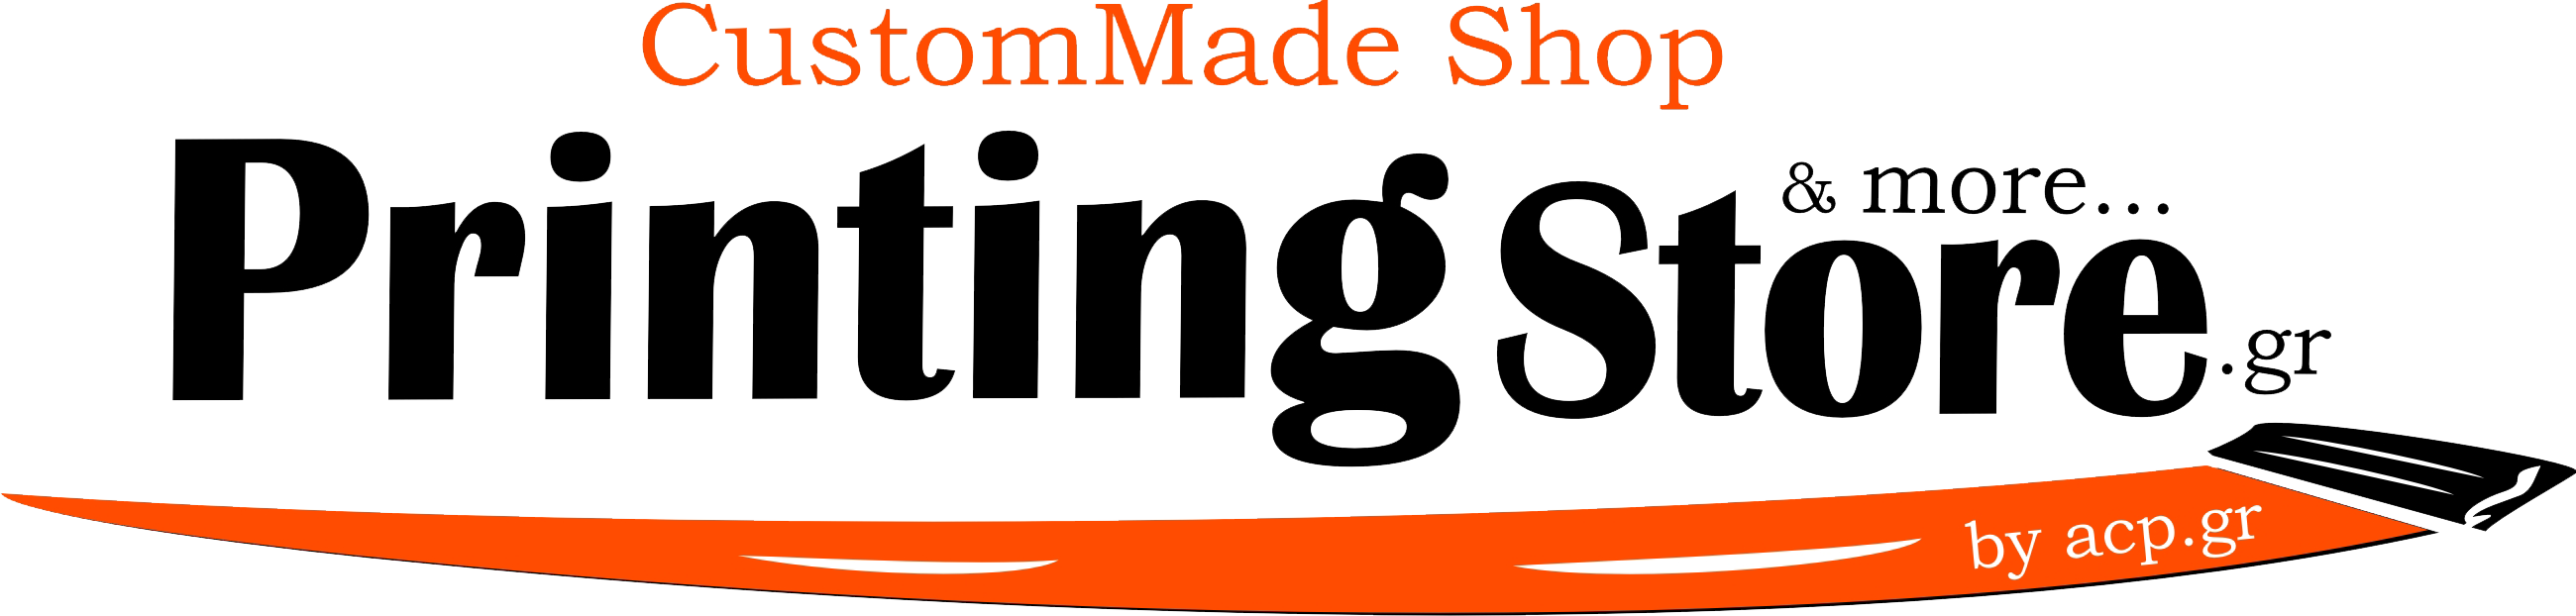 PrintingStore.gr Σταμπάδικο  Σχεδίασε σε Μπλούζες με στάμπες, κούπες, καπελά, φούτερ και πολλά άλλα